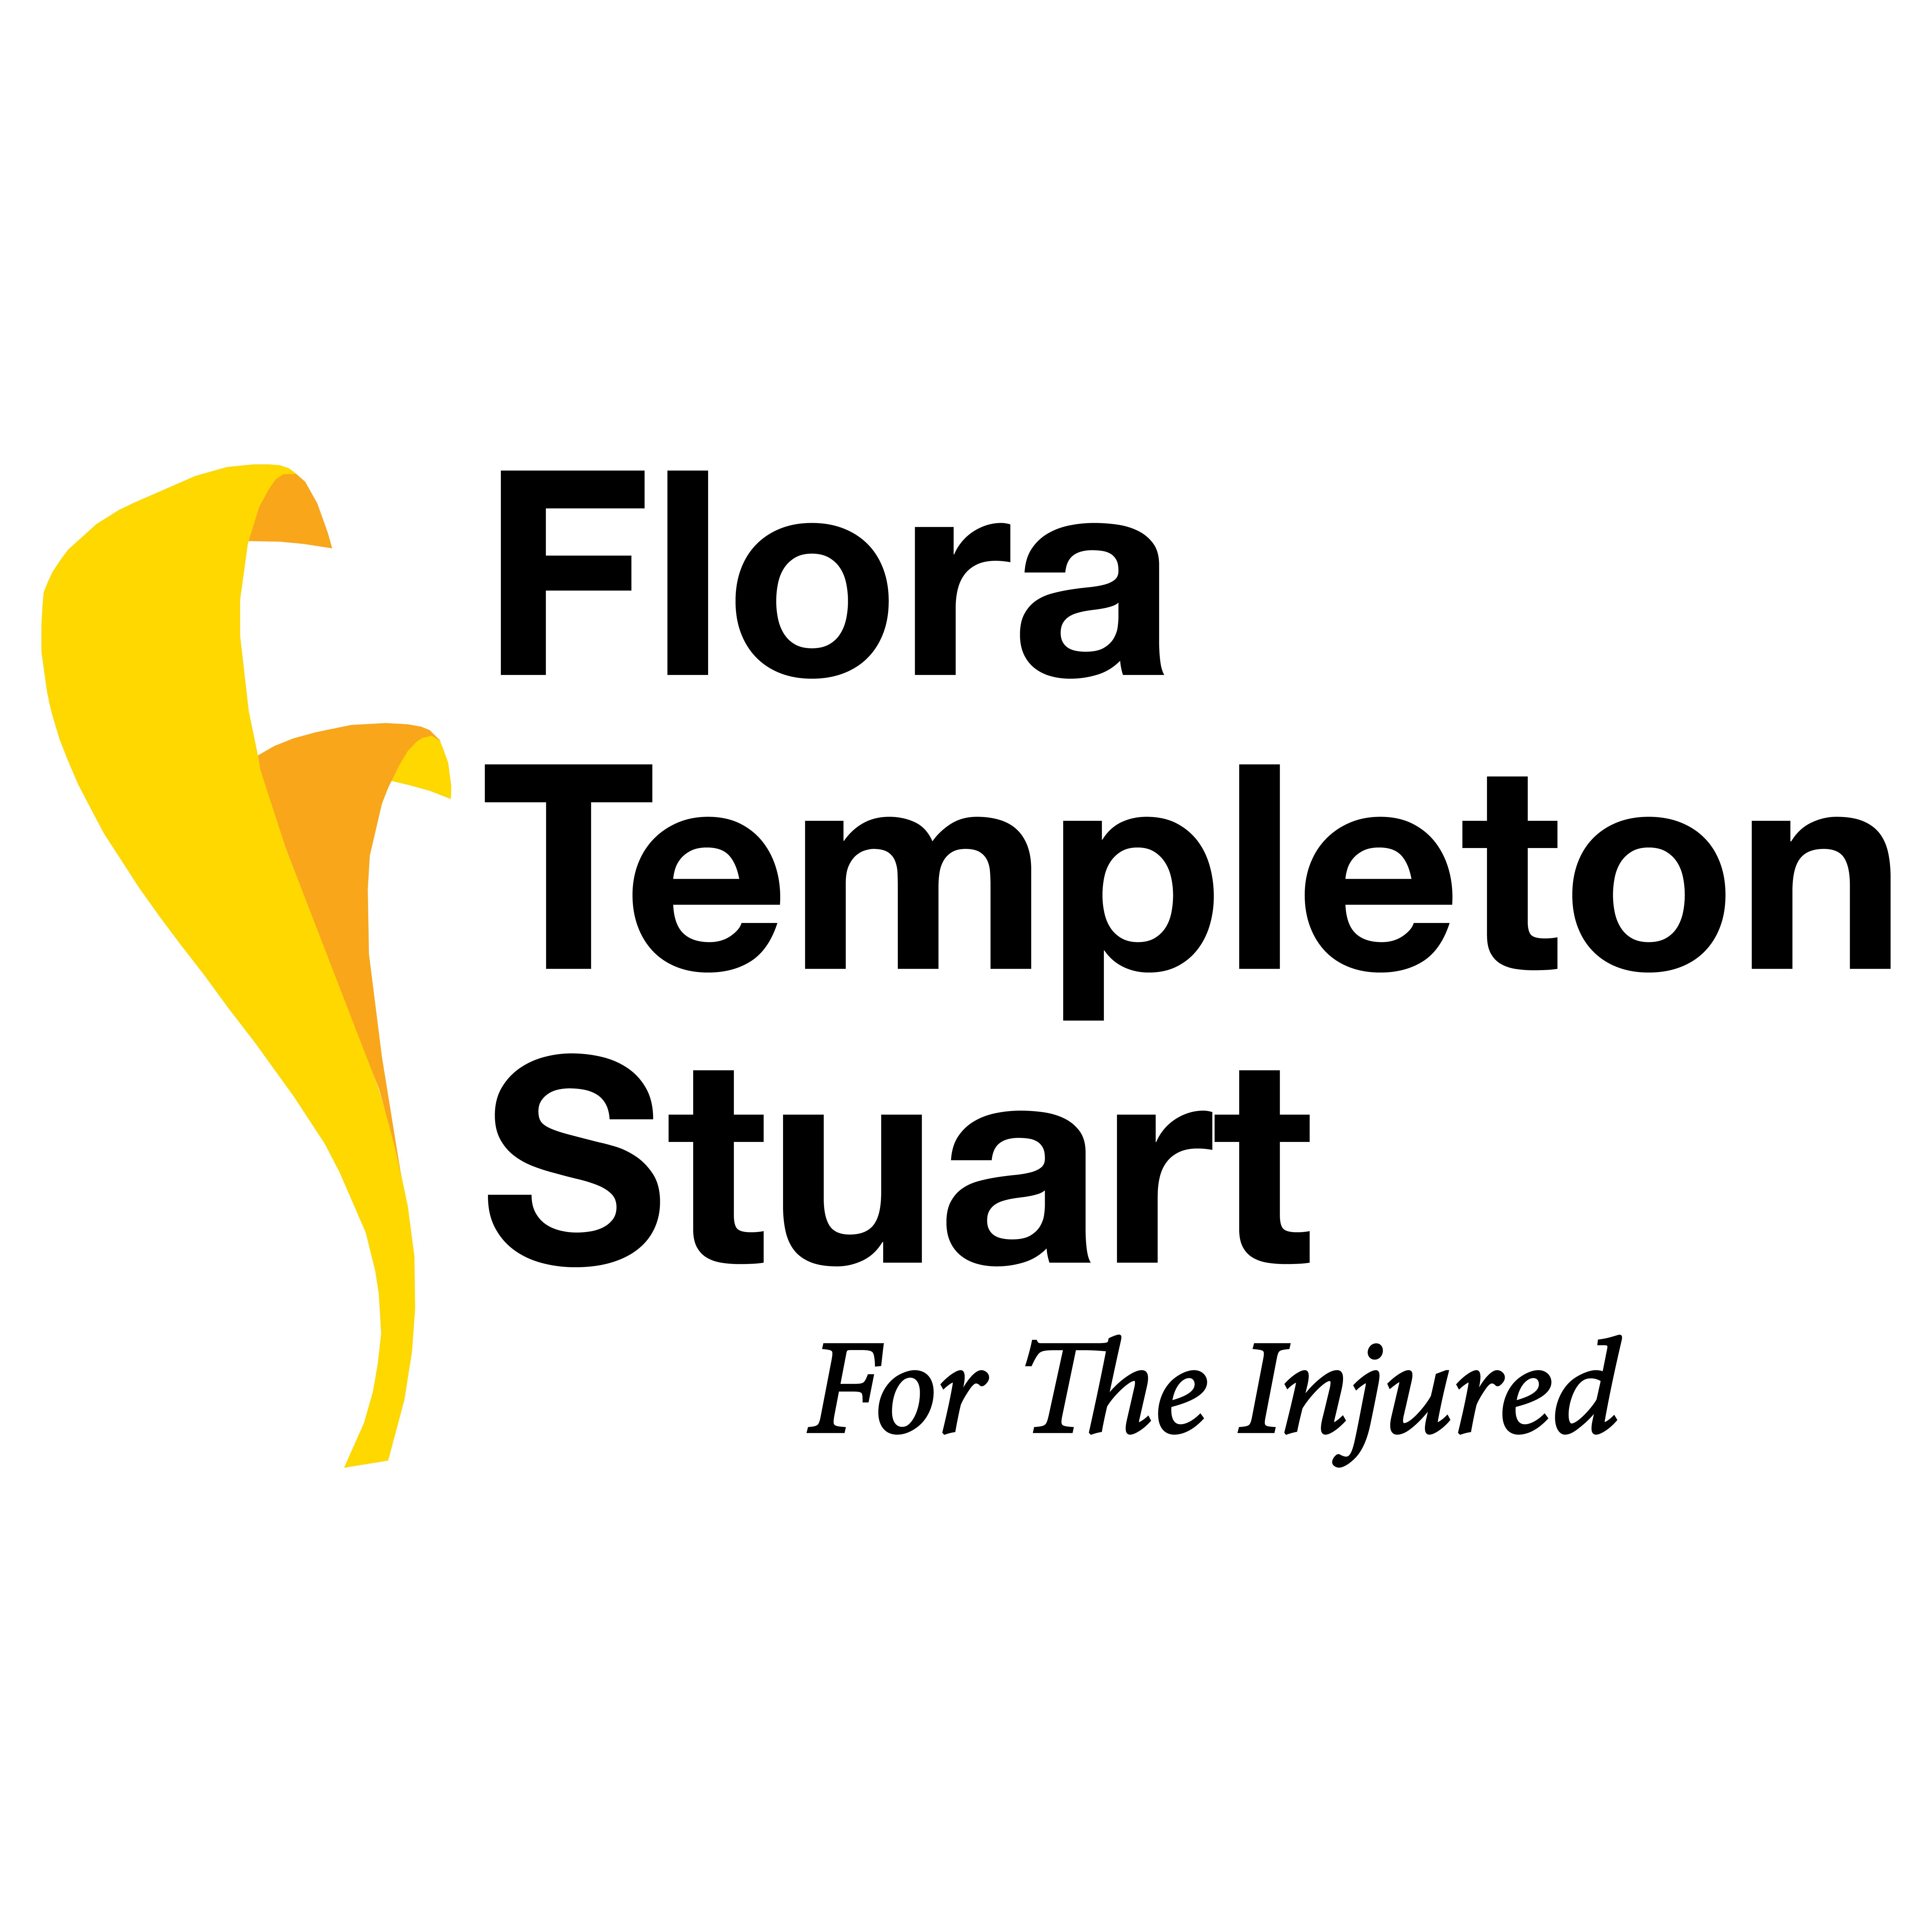 Flora Templeton Stuart Injury Lawyers